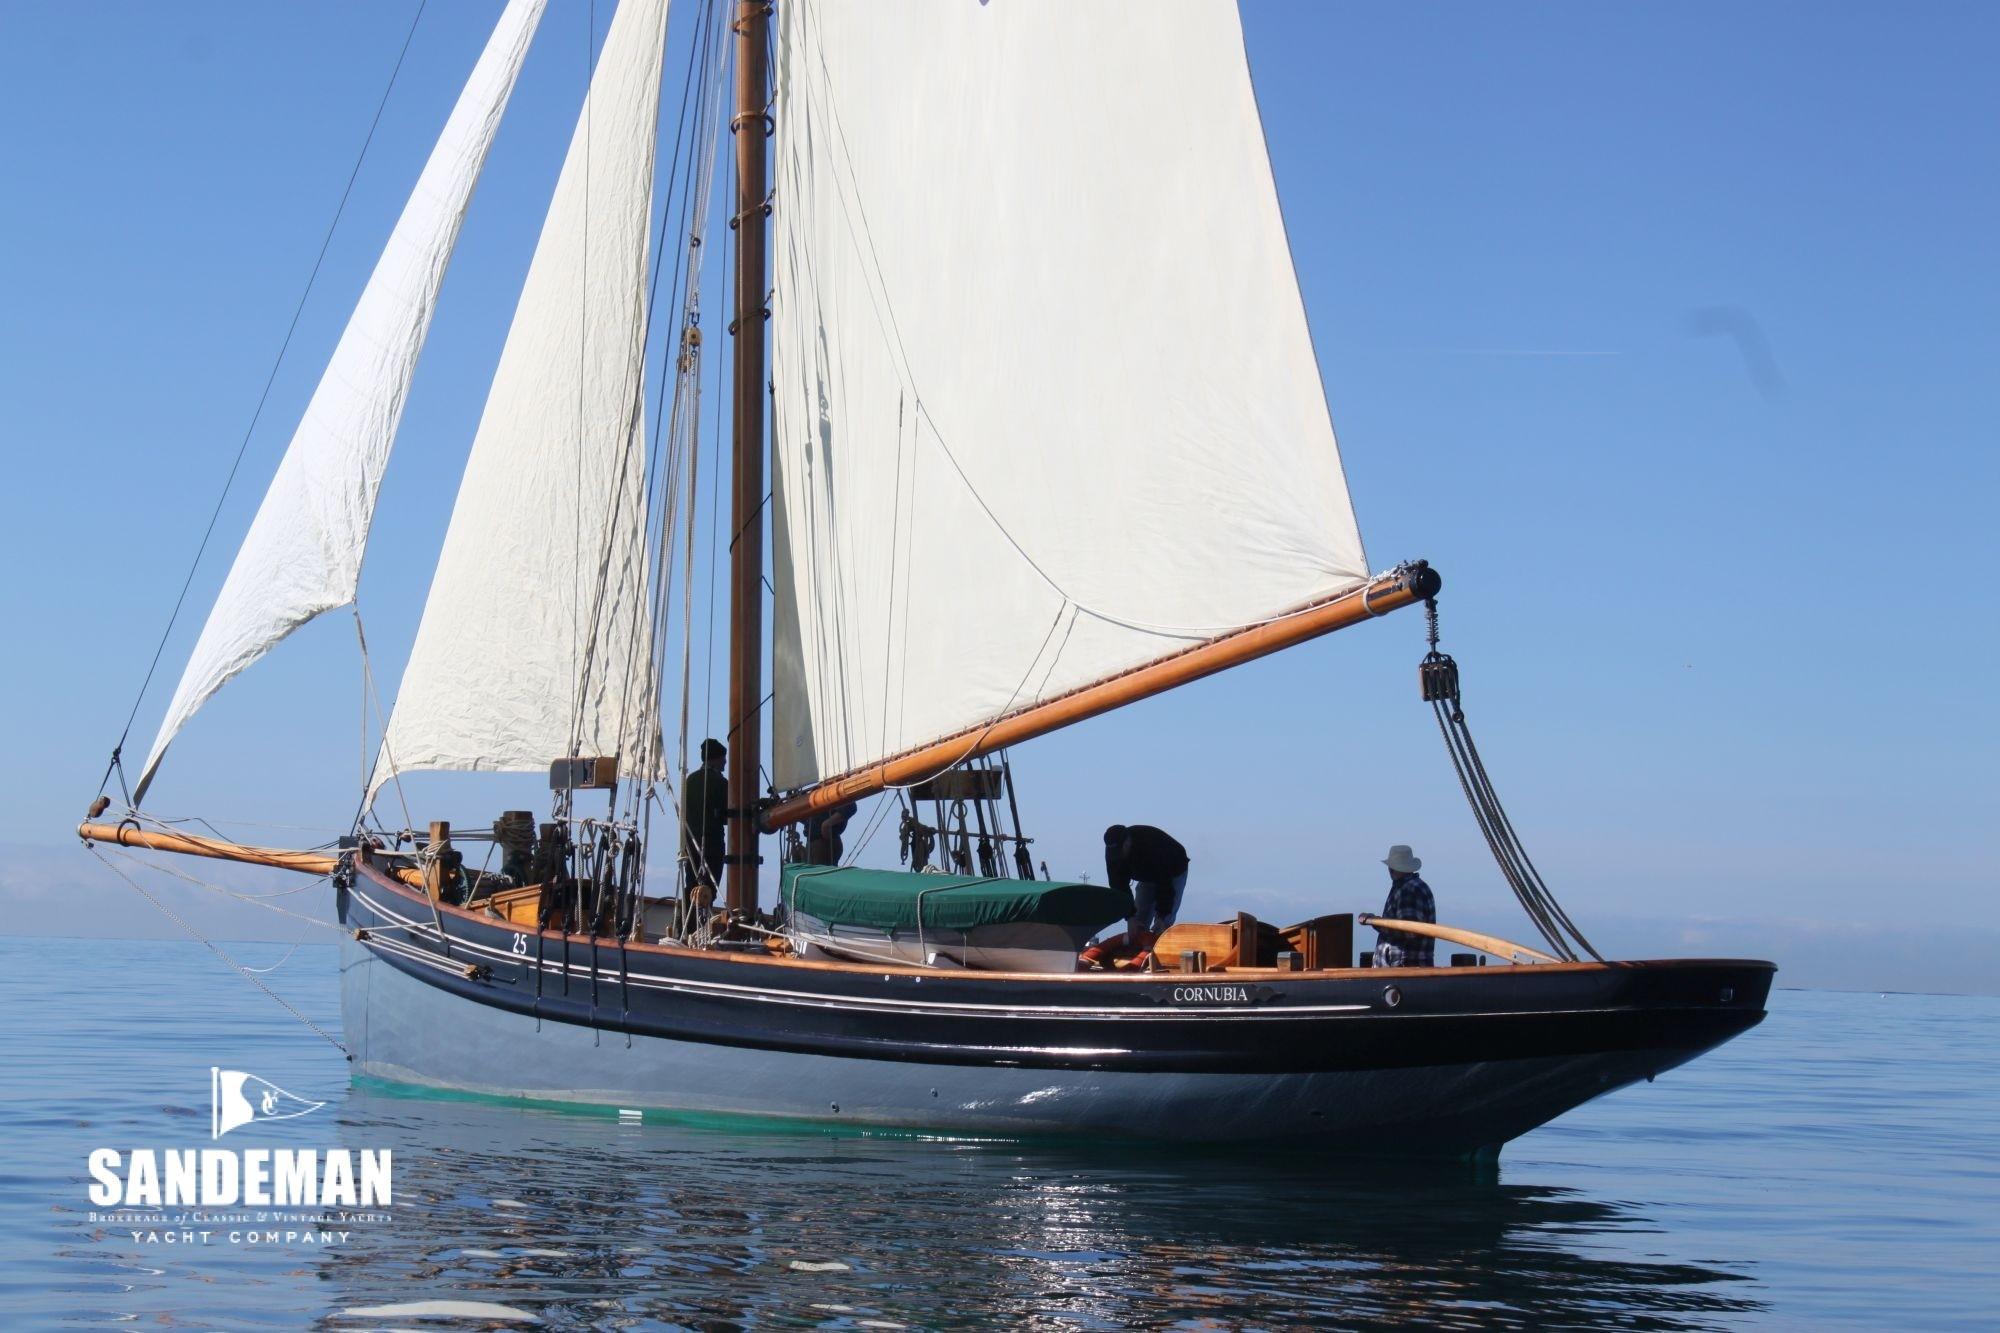 1911 Bristol Channel Pilot Cutter Sail Boat For Sale Www